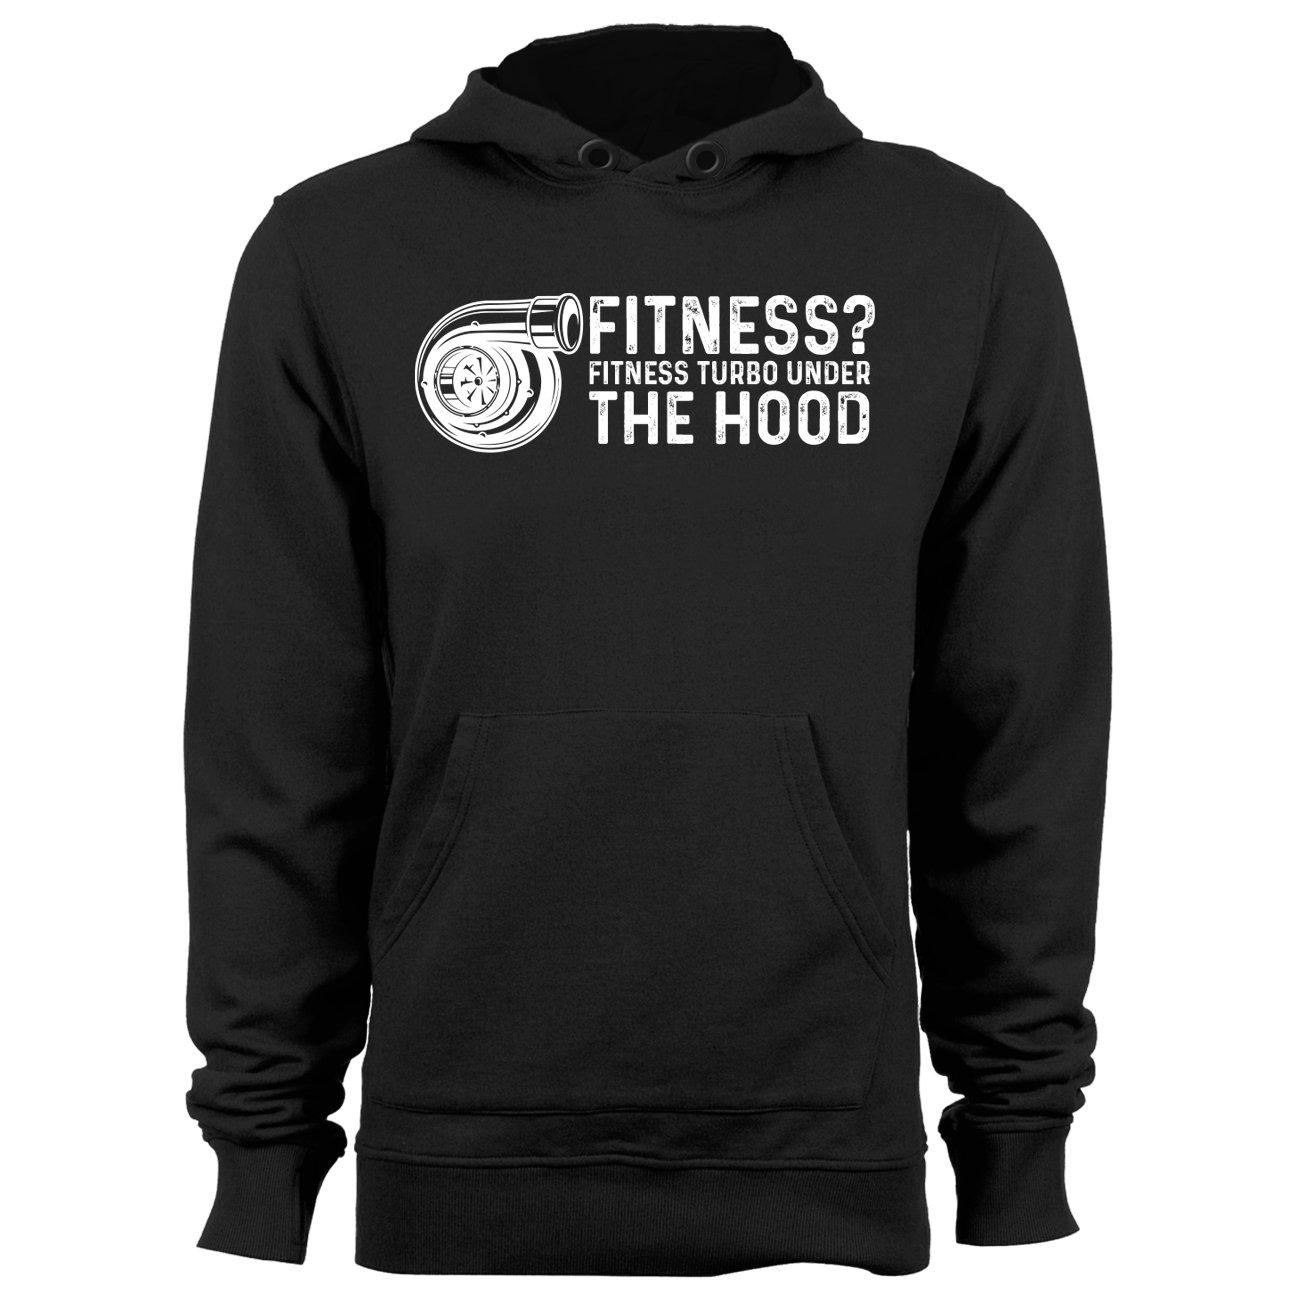 Fitness Turbo Hoodie